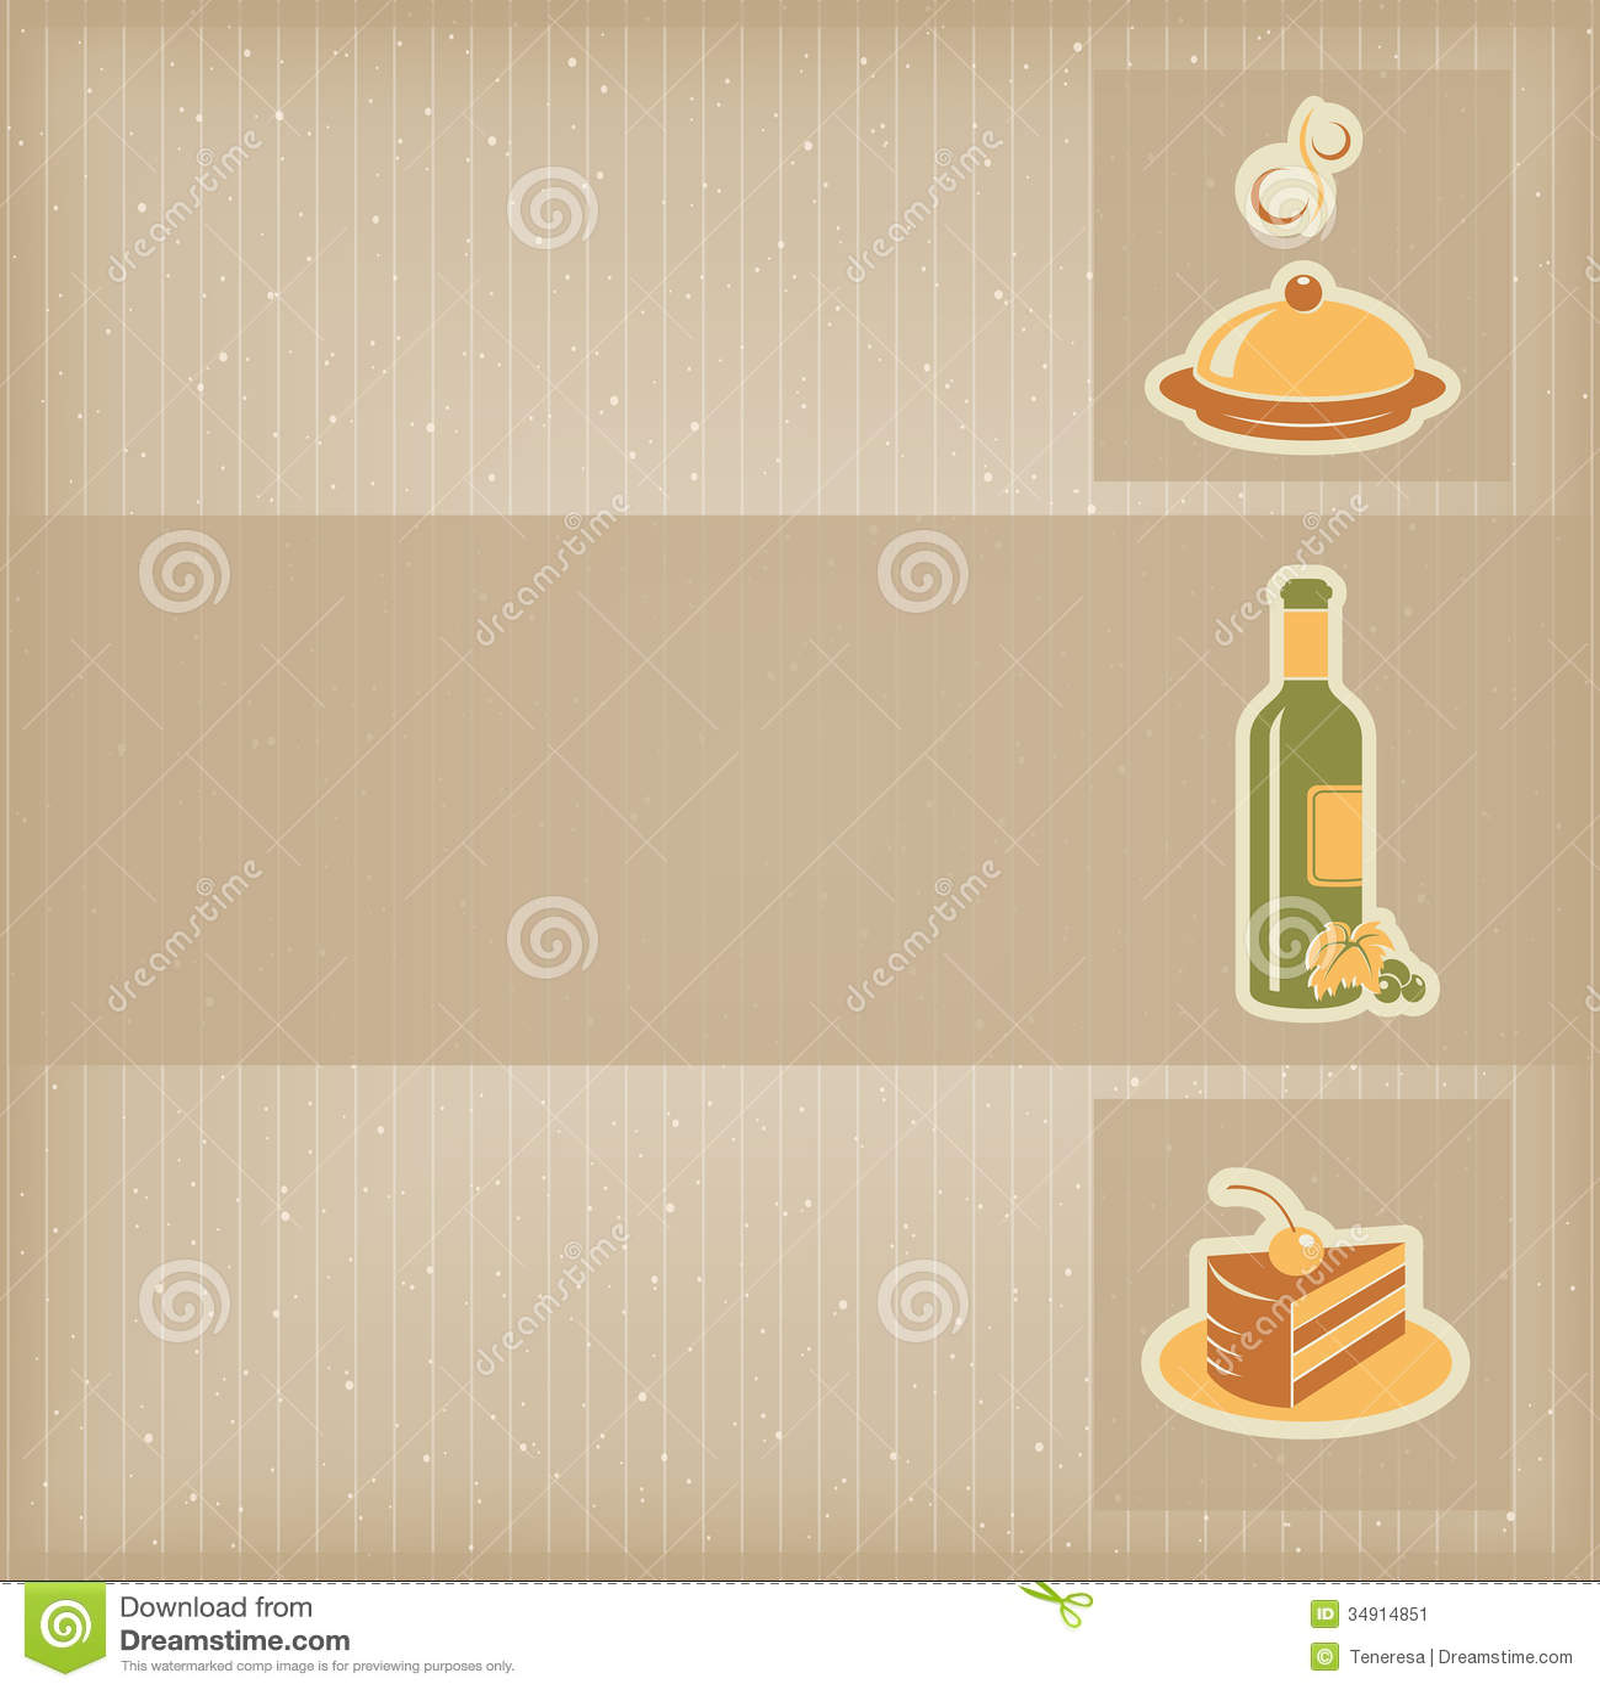 Food Menu Template Image Image 34914851 – Food Menu Template